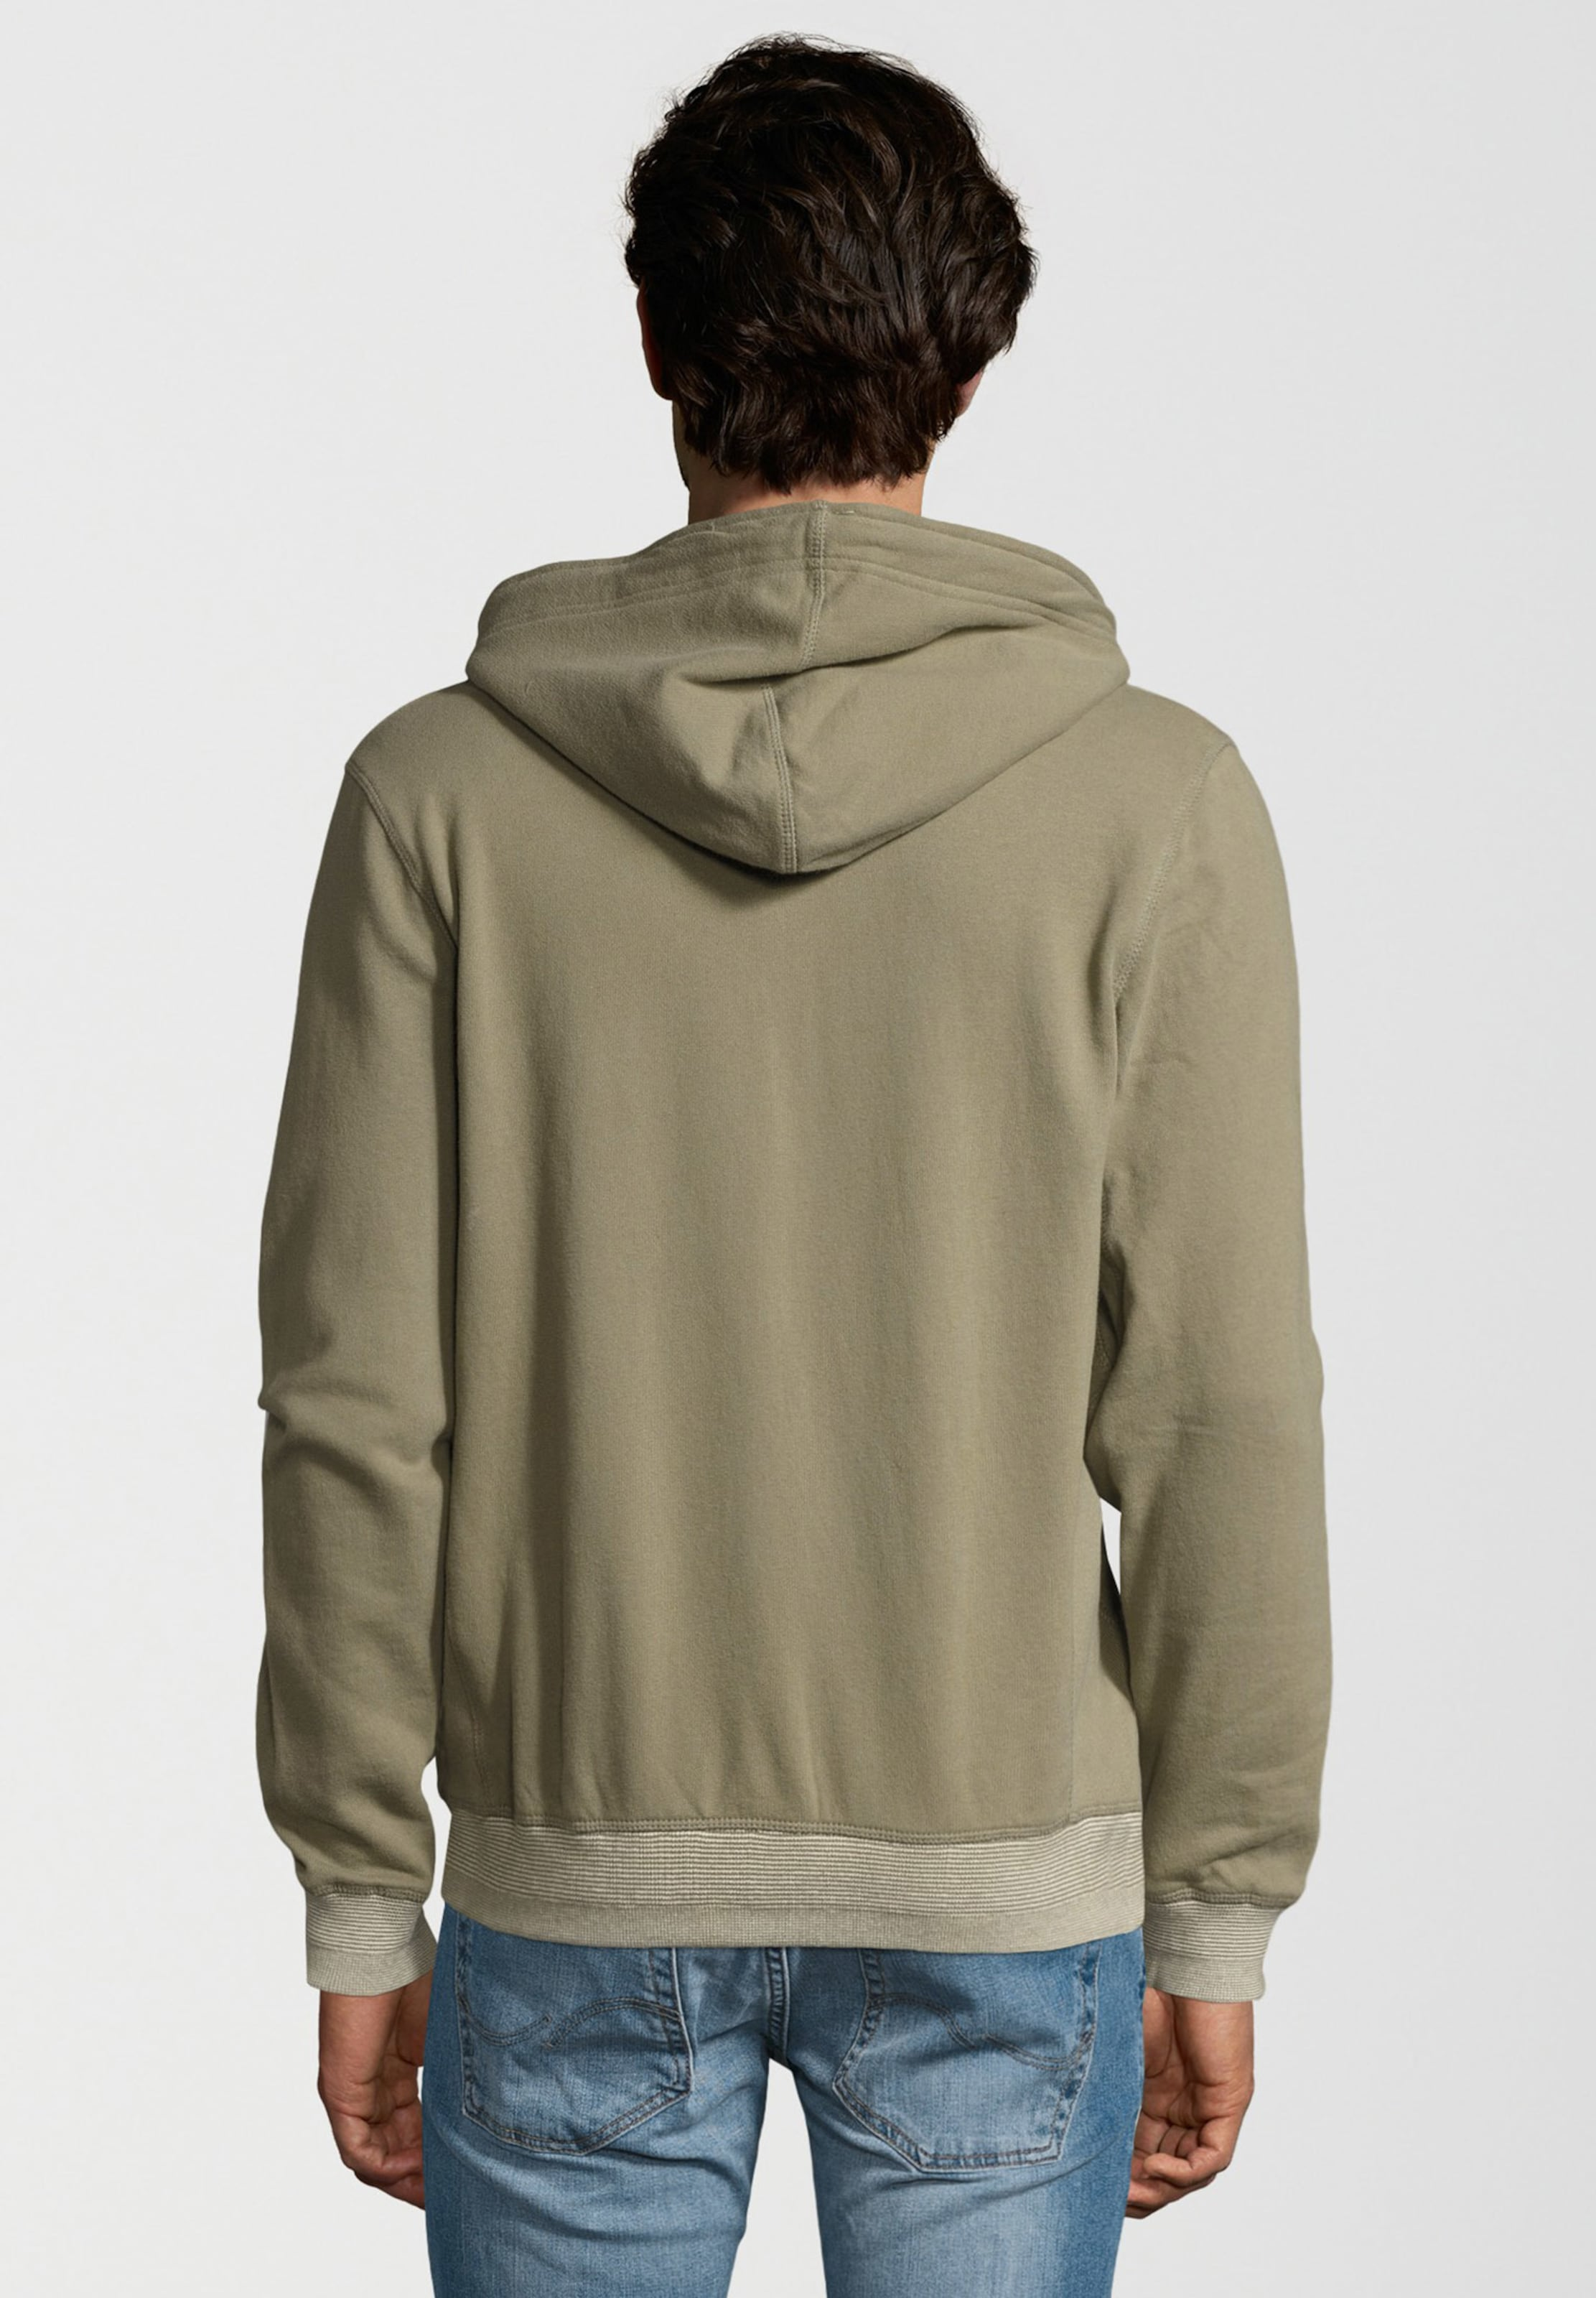 Rabatt Echt Pepe Jeans Kapuzensweatjacke 'GIUSEPPE' Unter Online-Verkauf Auslass Wahl Manchester vRymVdhn